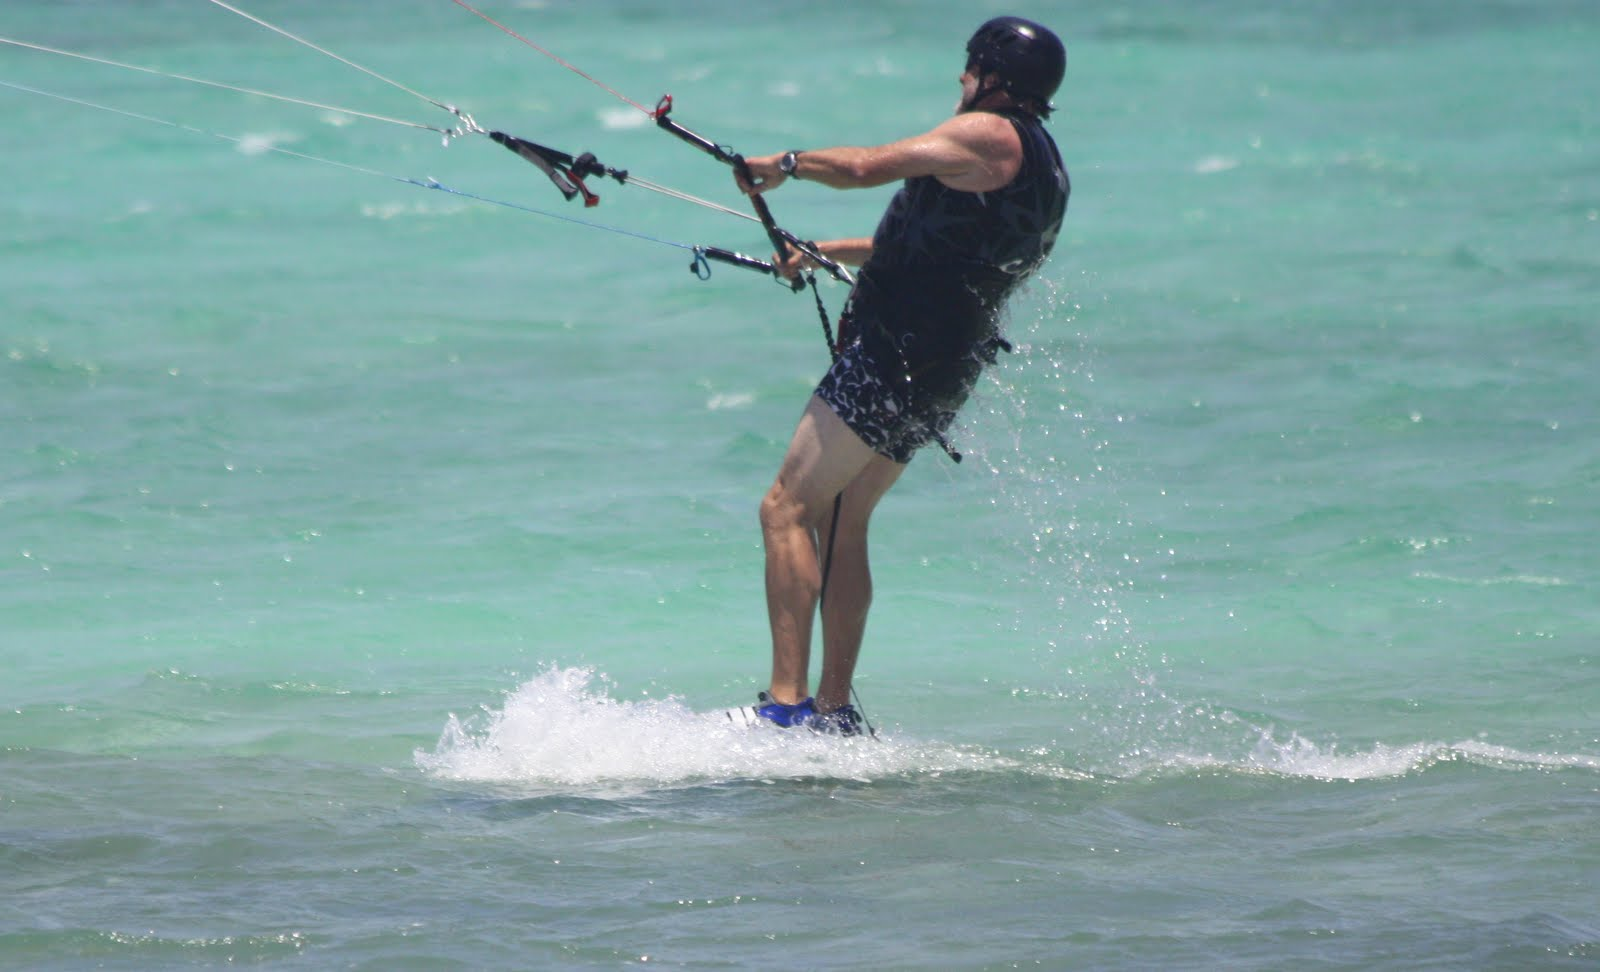 Dad kitesurfing, kitesurf cayman,